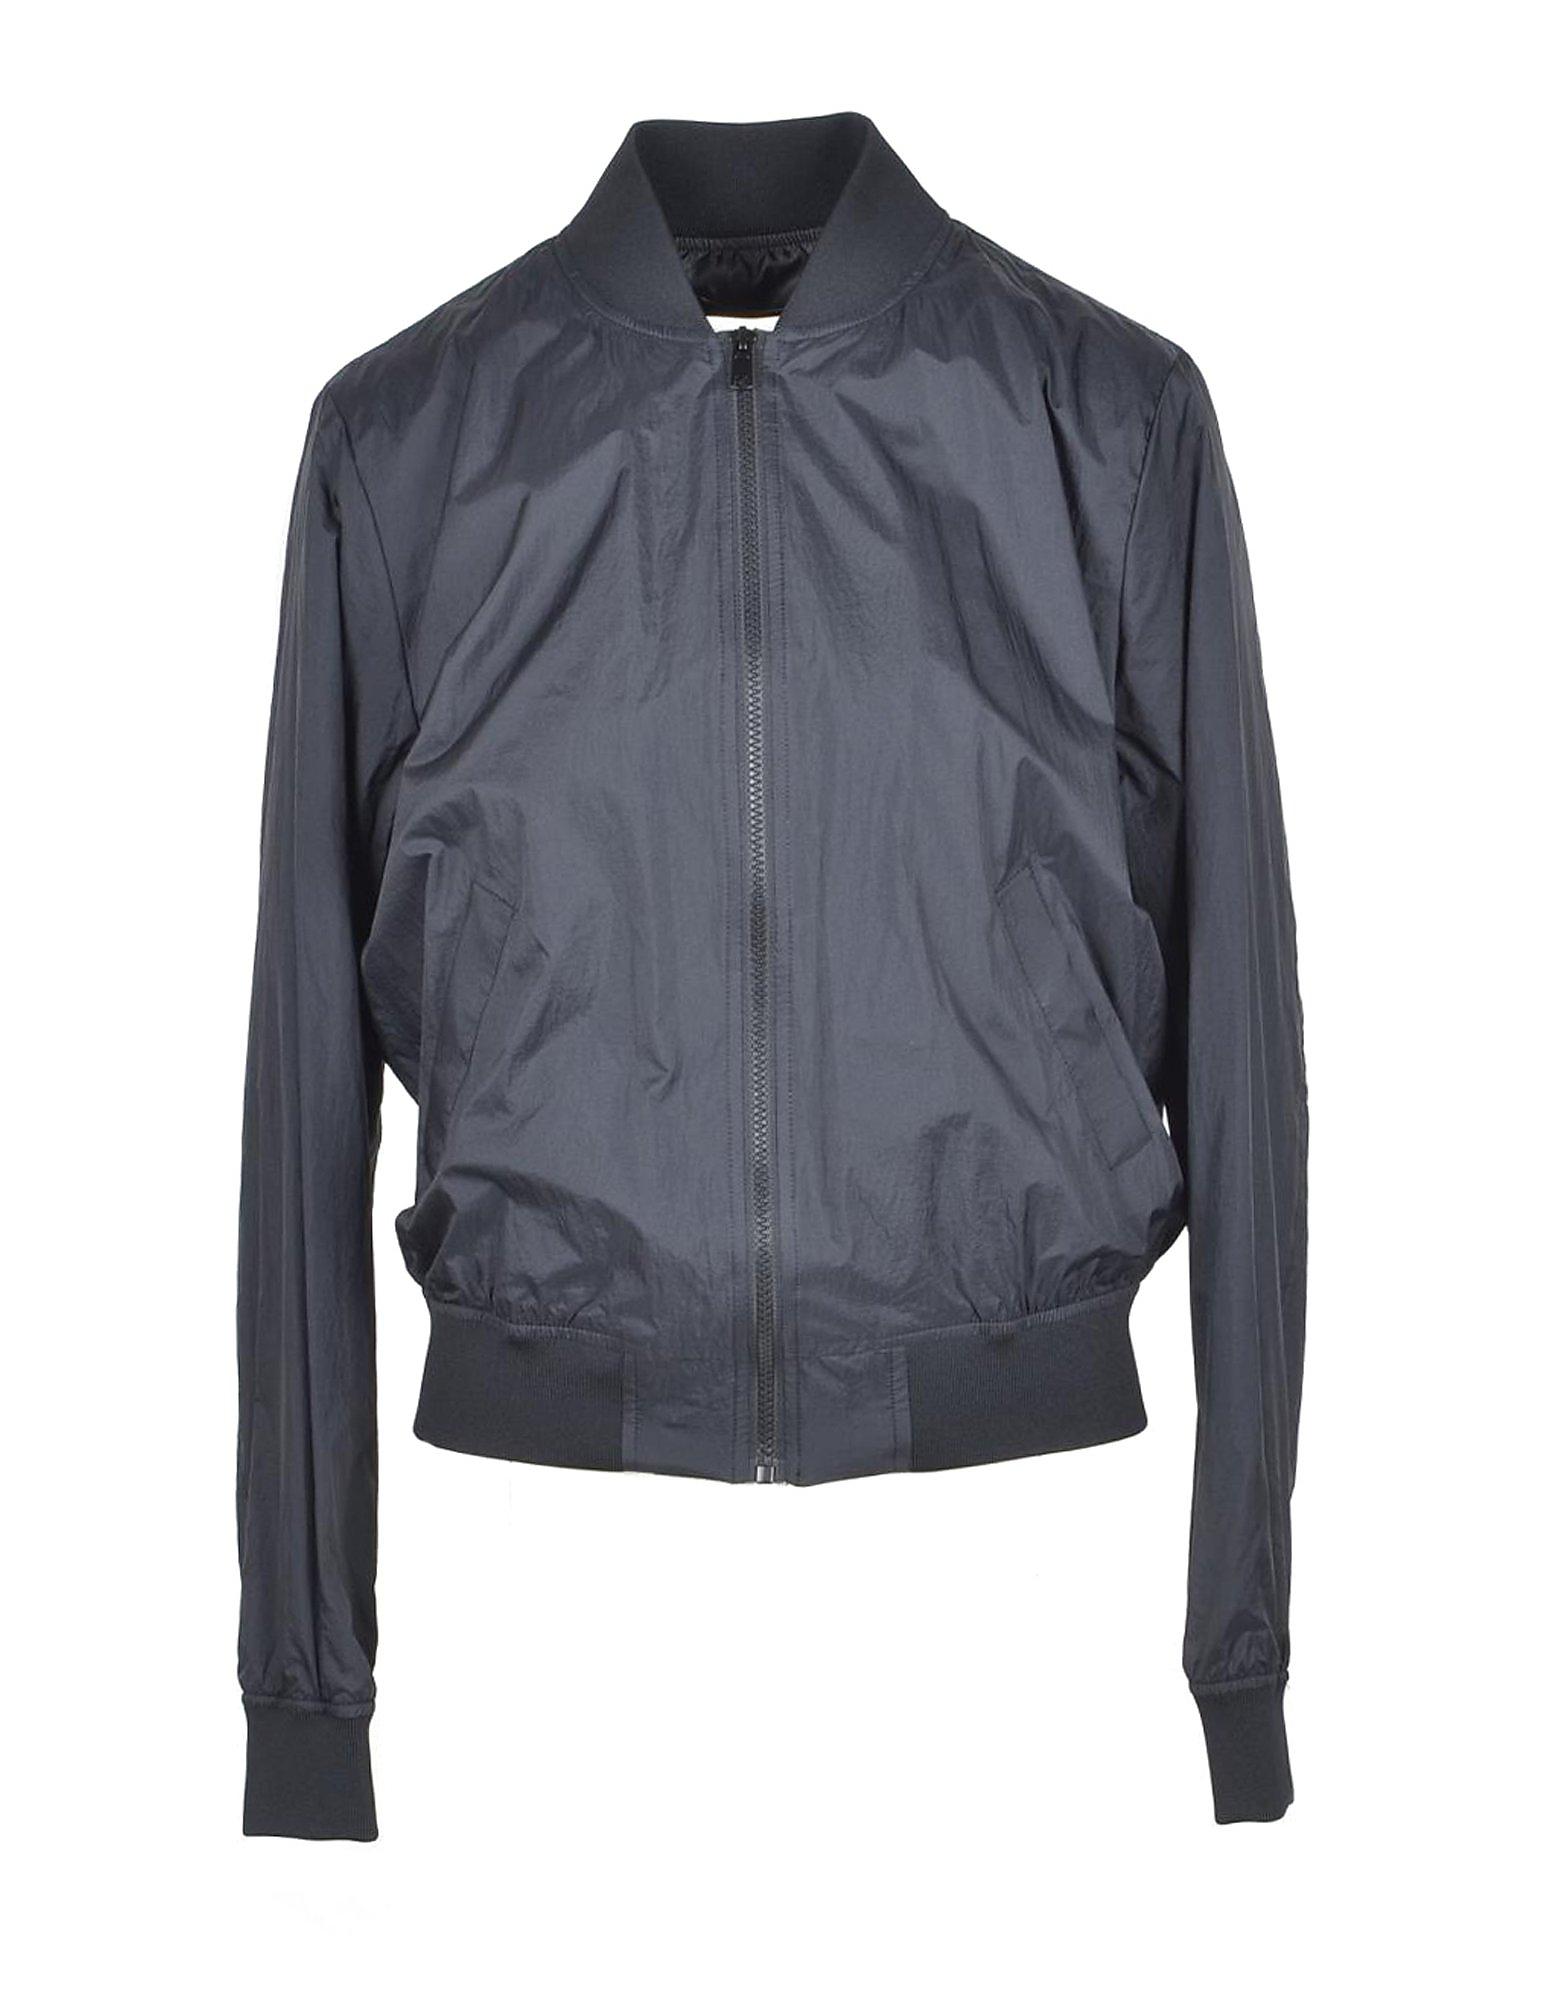 Love Moschino Designer Coats & Jackets, Women's Black Bomber Jacket